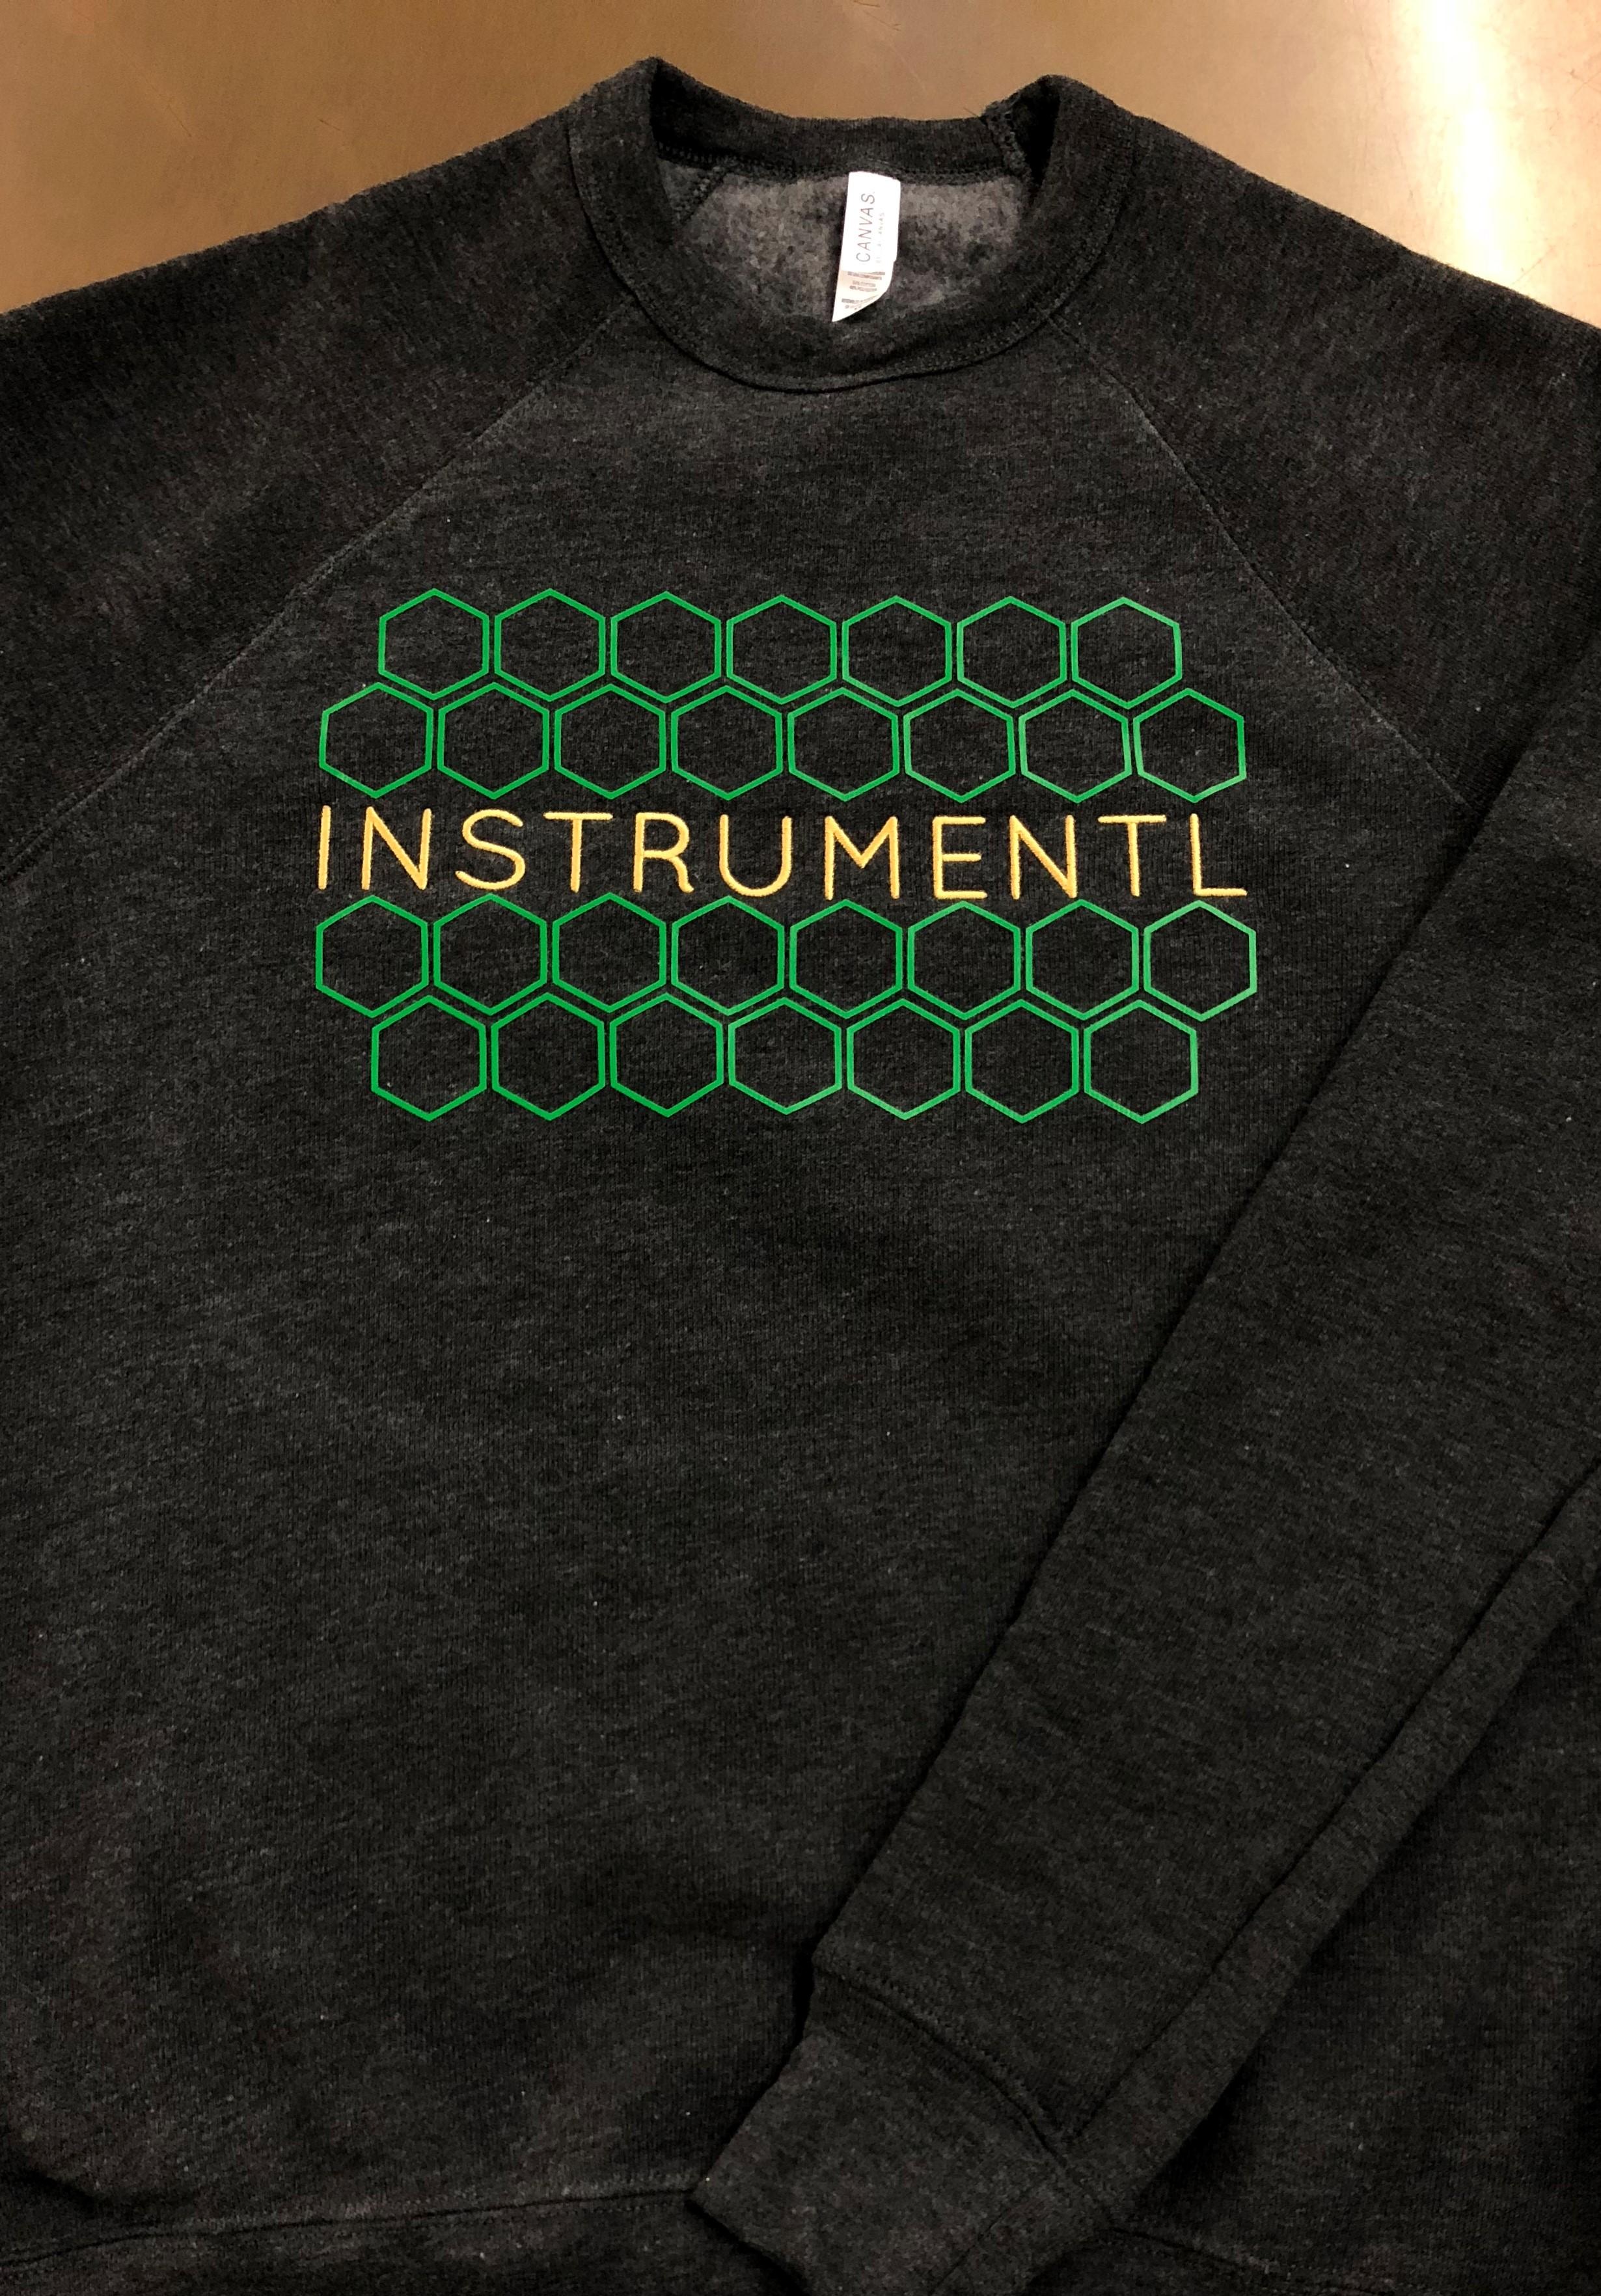 logounltd_laser_etching_embroidery_screen_printing_apparel_uniform_custom_tshirts_dye_sublimation_kirkland_bellevue_seattle_redmond_branded_merchandise_promotional_products_logo_unltd_amazon_aws_patches_ (3).jpg